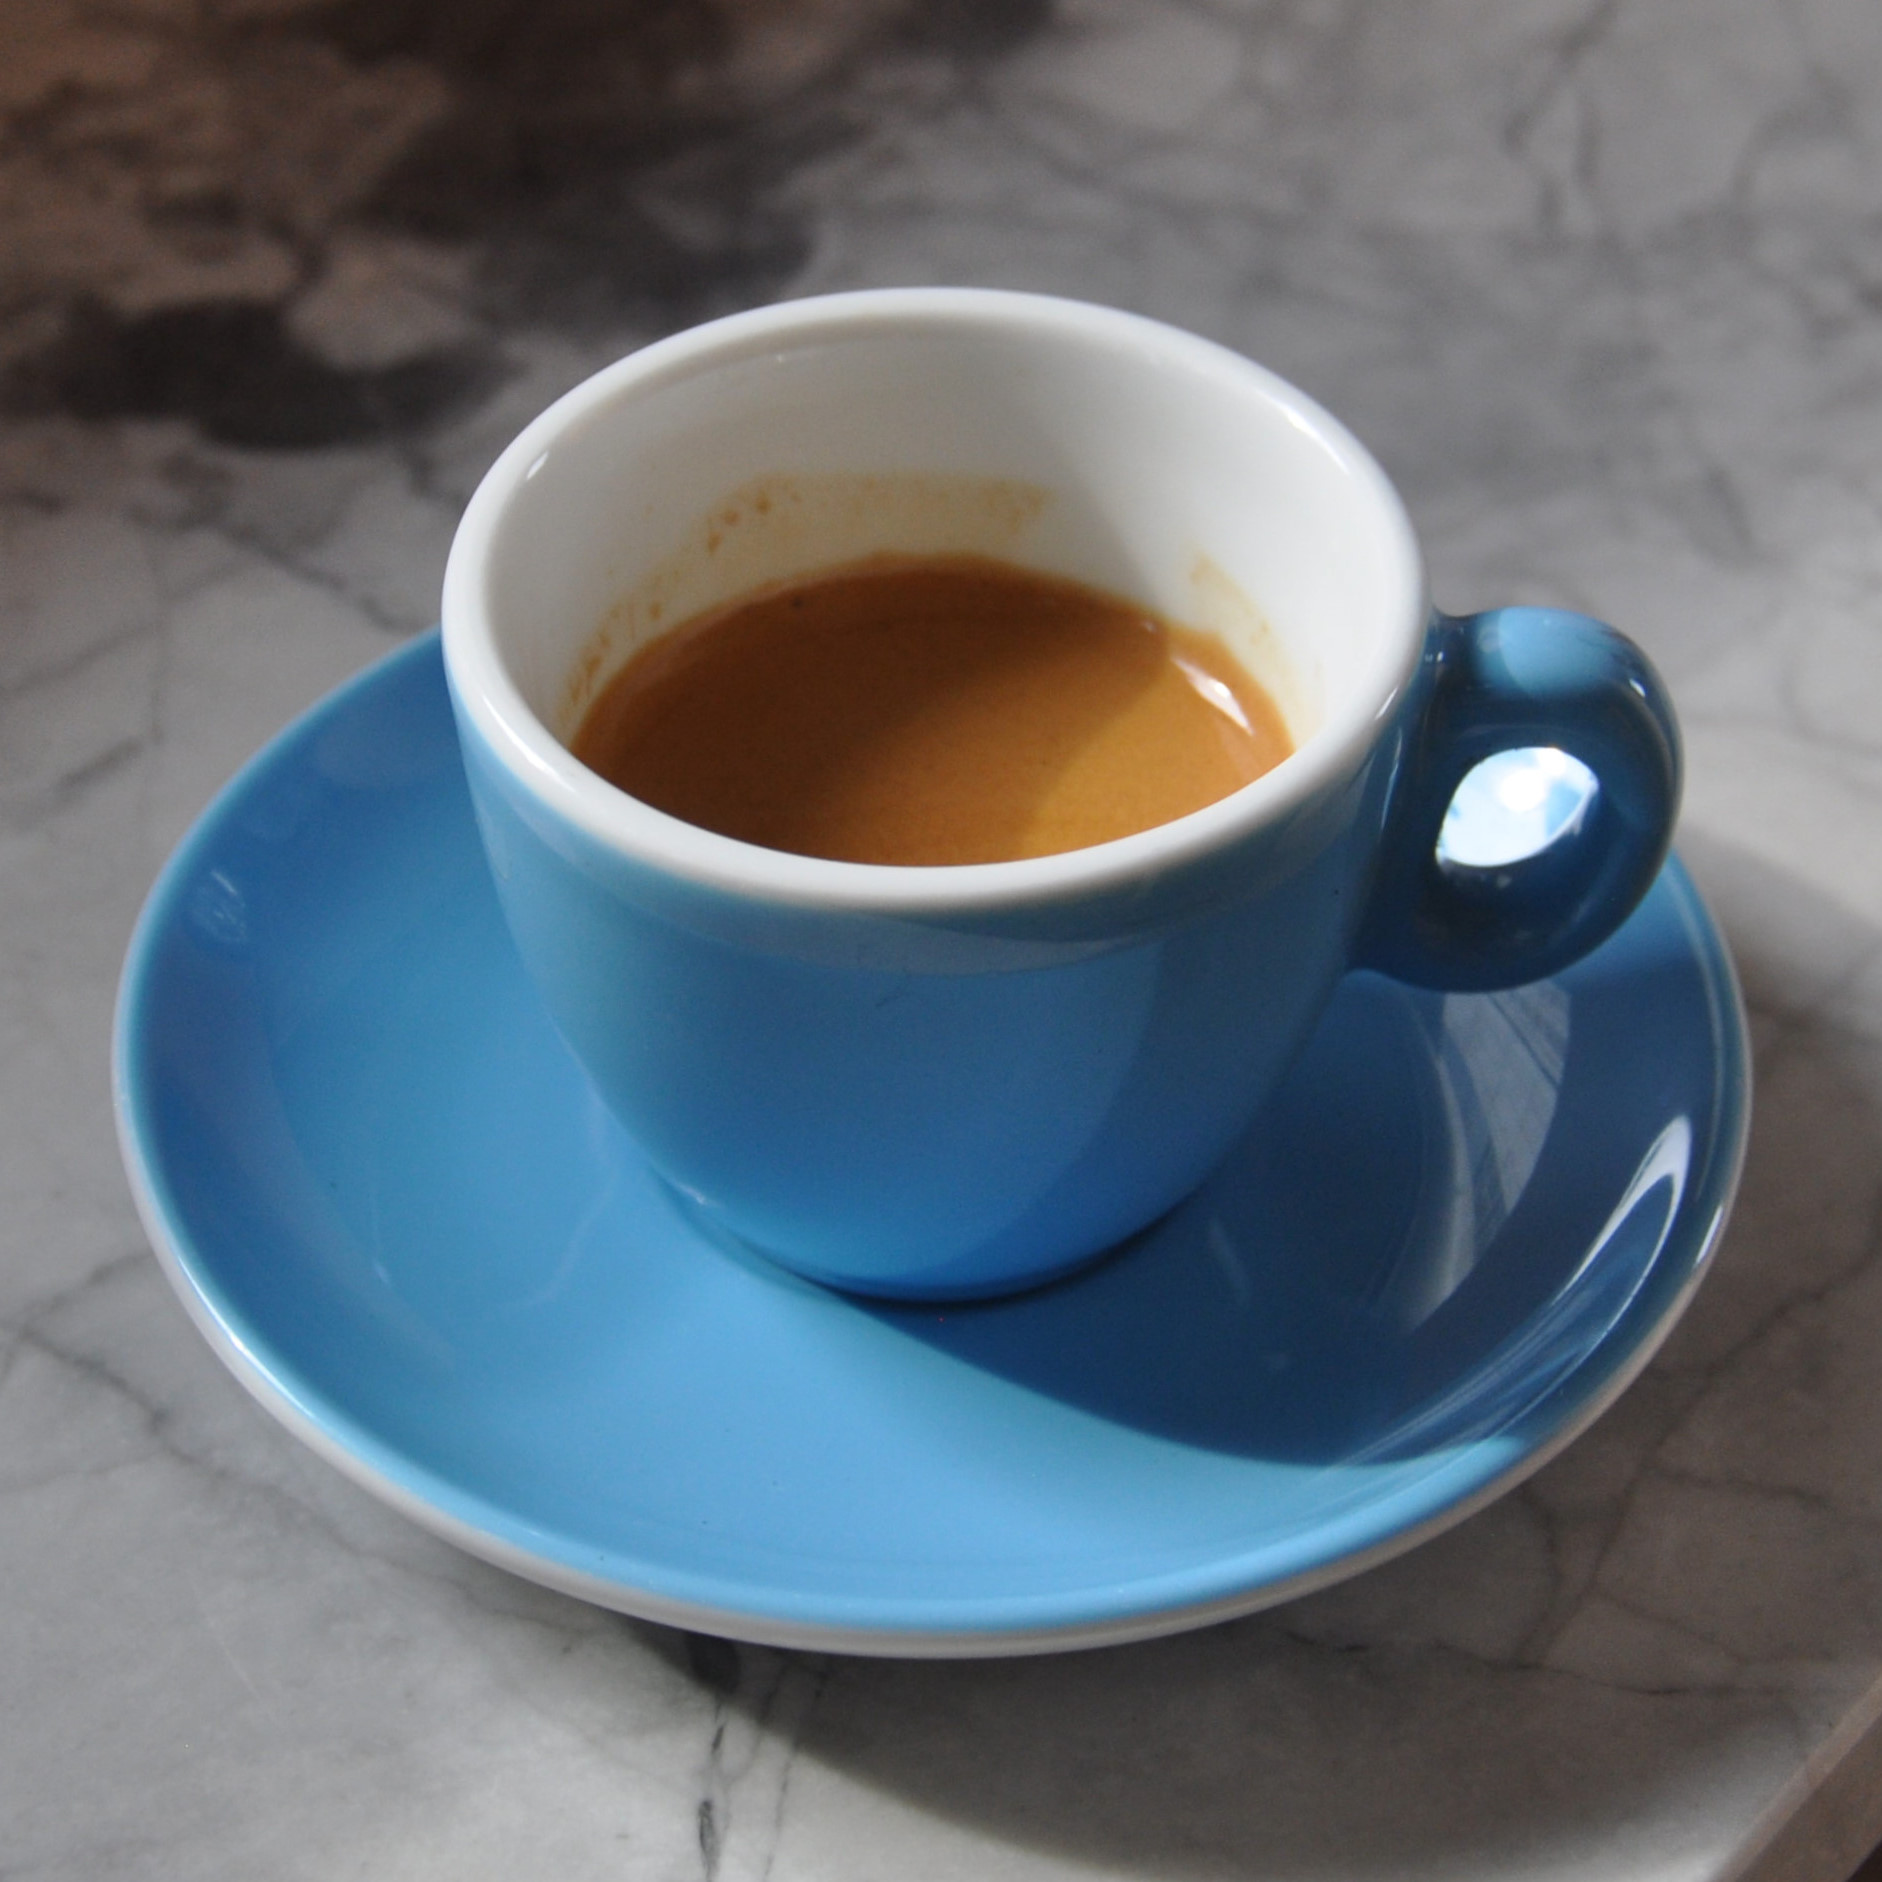 A lovely espresso, pulled on Treves & Hyde's Mavam Espresso machine using Volcano Coffee Works' Full Steam espresso.